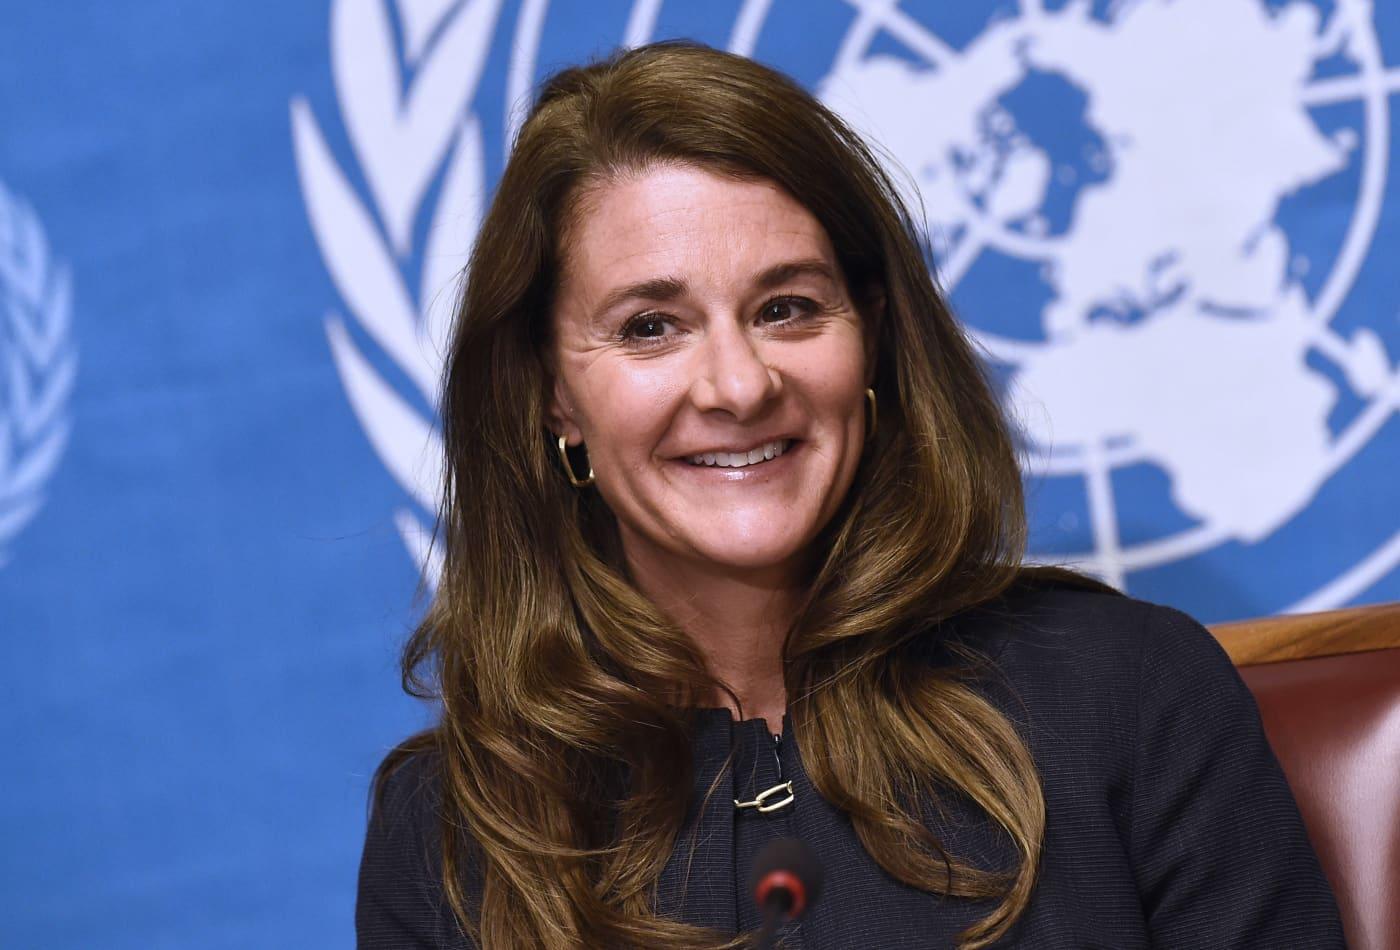 Gates Foundation Directs Funding Toward >> Melinda Gates Is Spending 170 Million To Promote Women S Equality